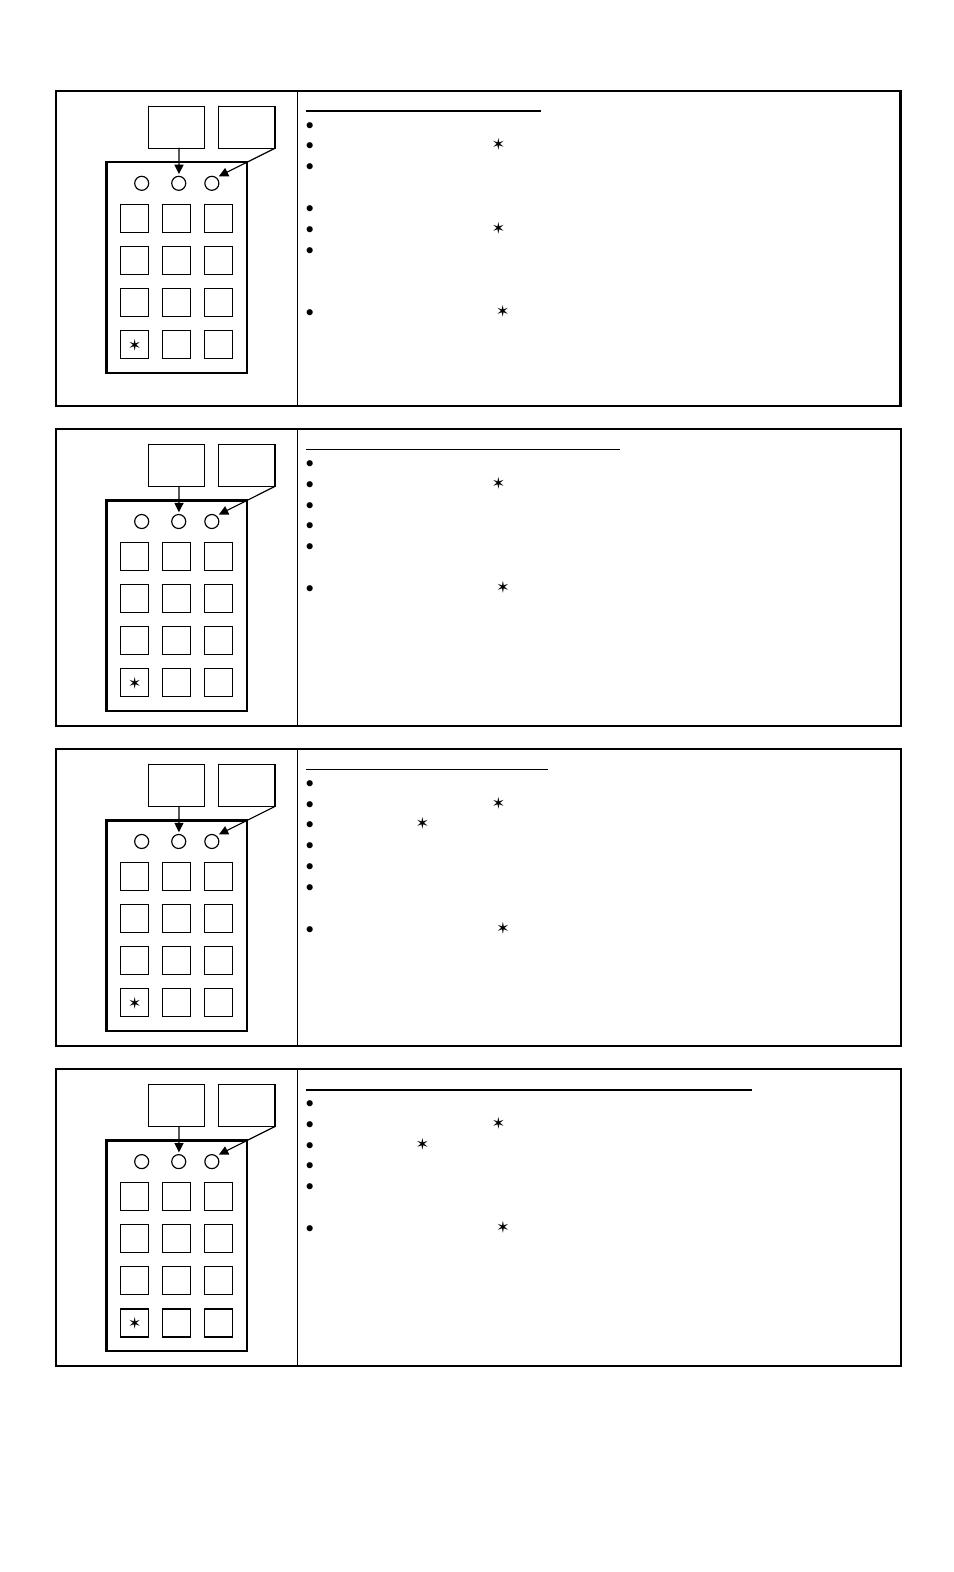 Securitron DK-12 User Manual | Page 5 / 8